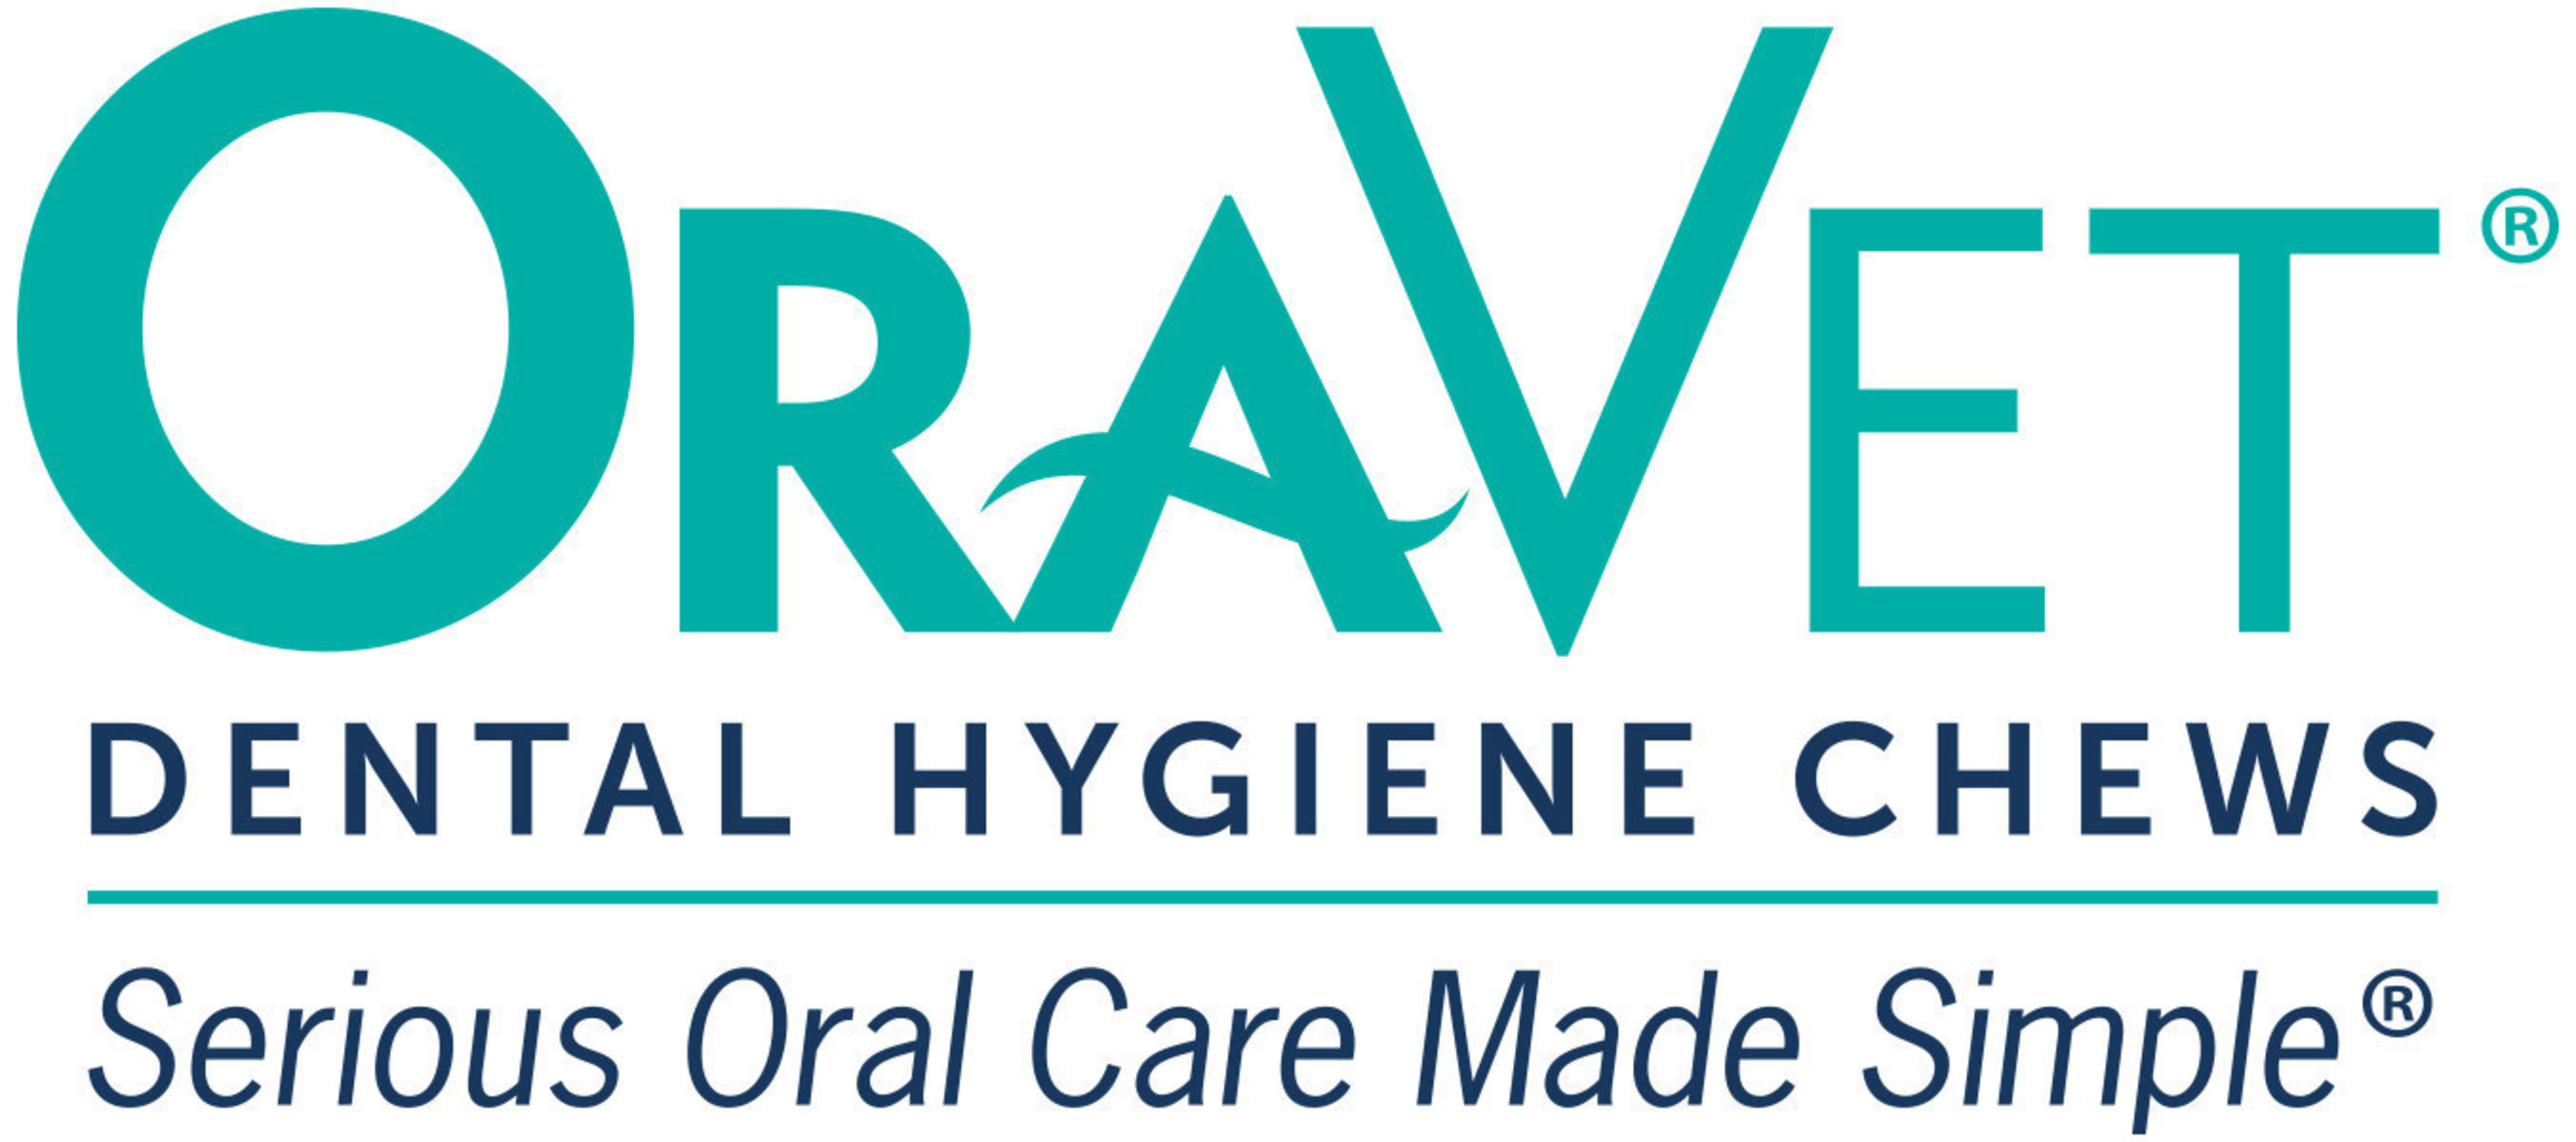 Oravet(R) Dental Hygiene Chews Logo